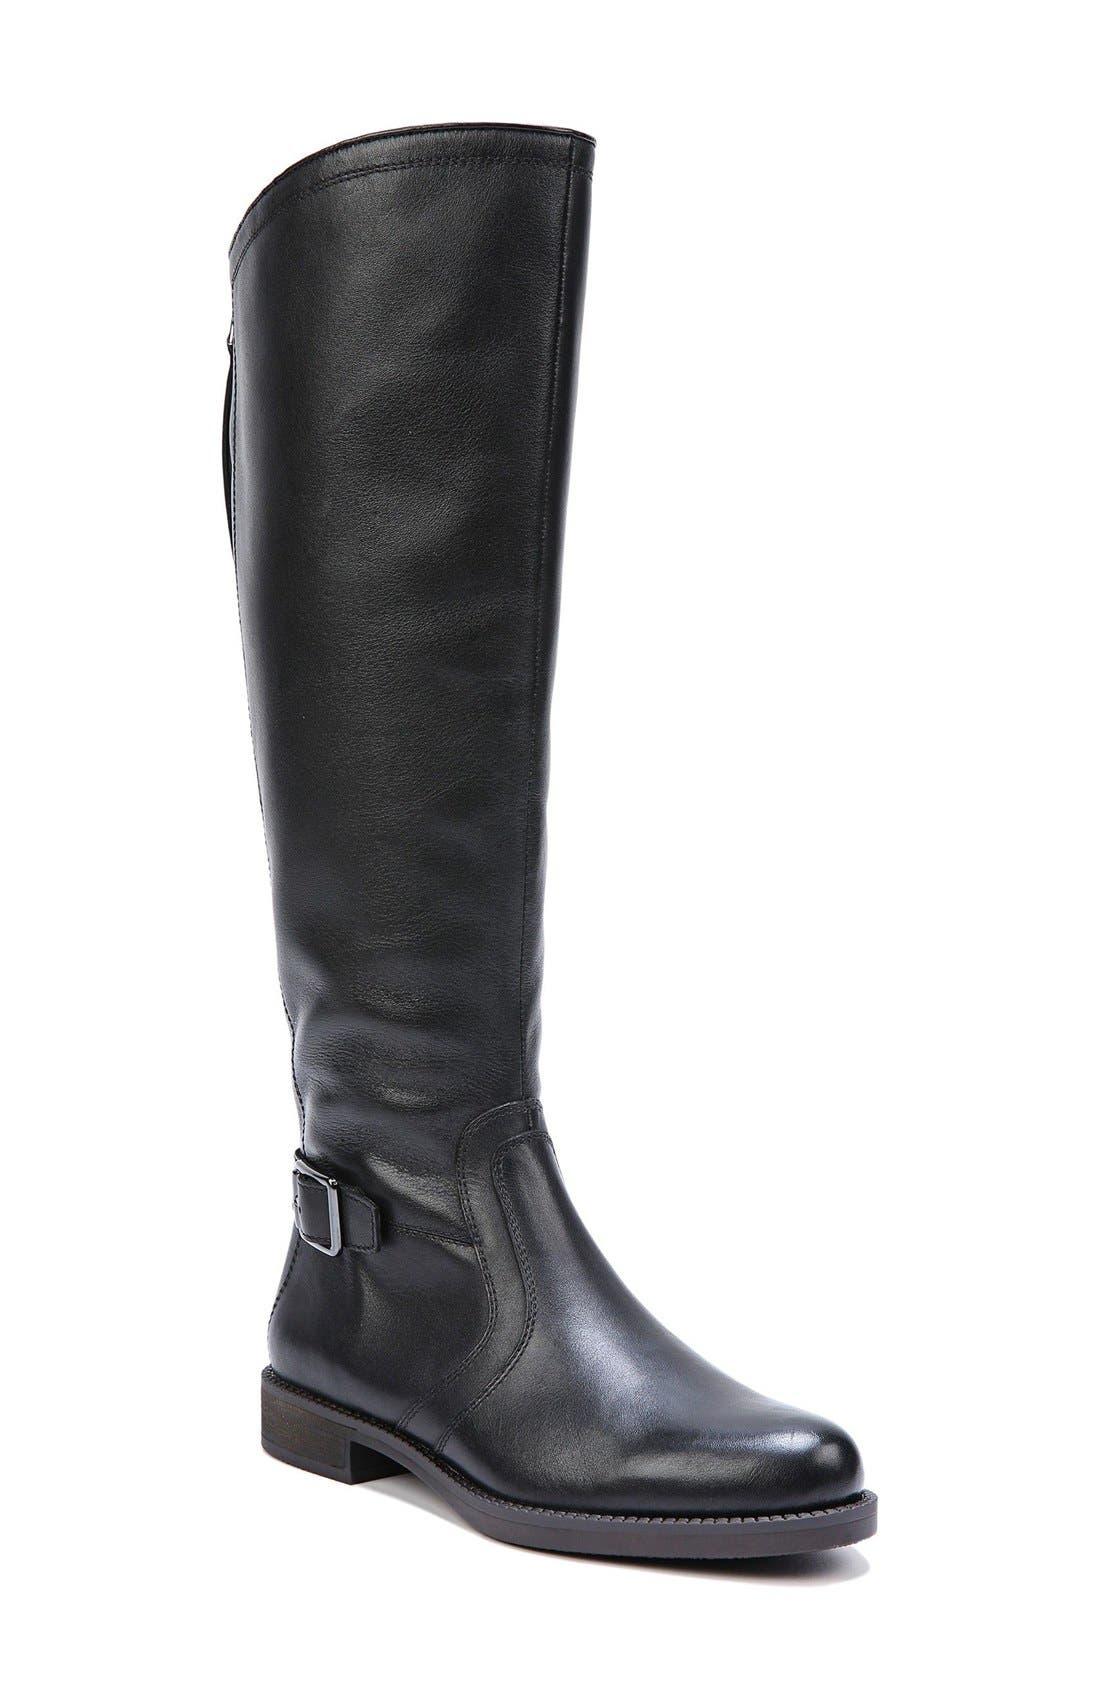 Alternate Image 1 Selected - SARTO by Franco Sarto Carlana Riding Boot (Women) (Wide Calf)